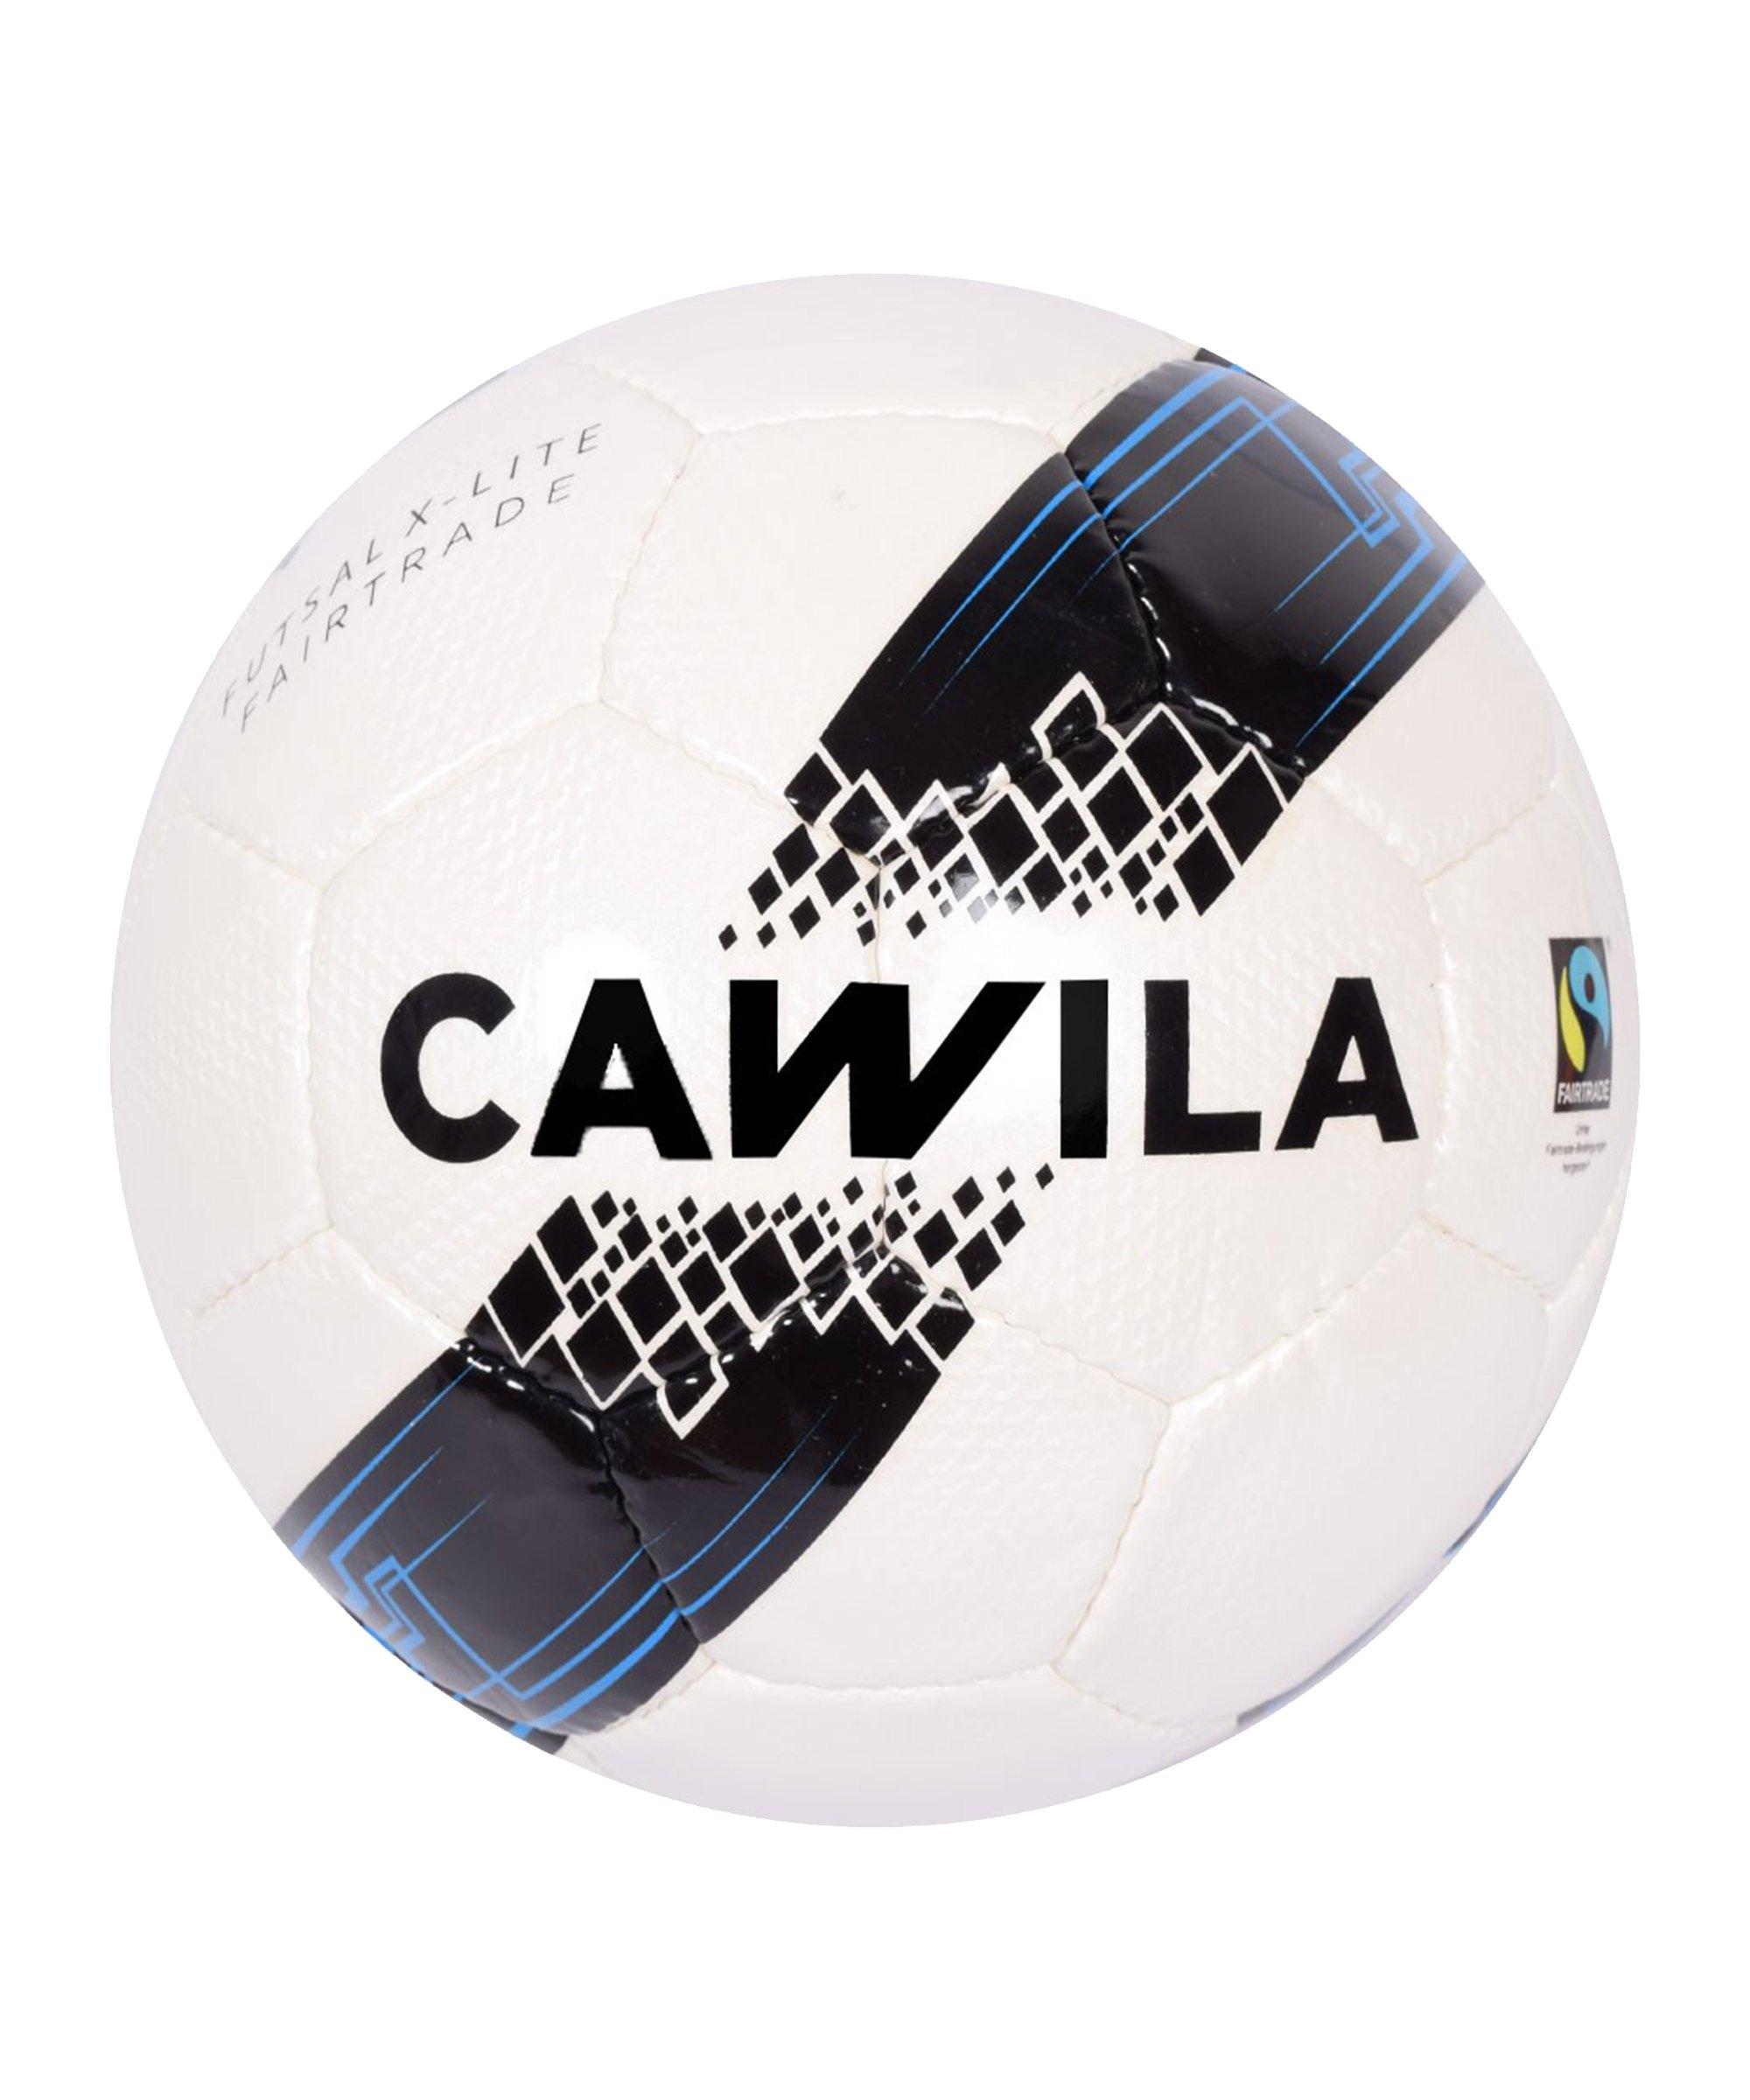 Cawila Futsal FAIR TRADE X-LITE 290 290g 4 - weiss